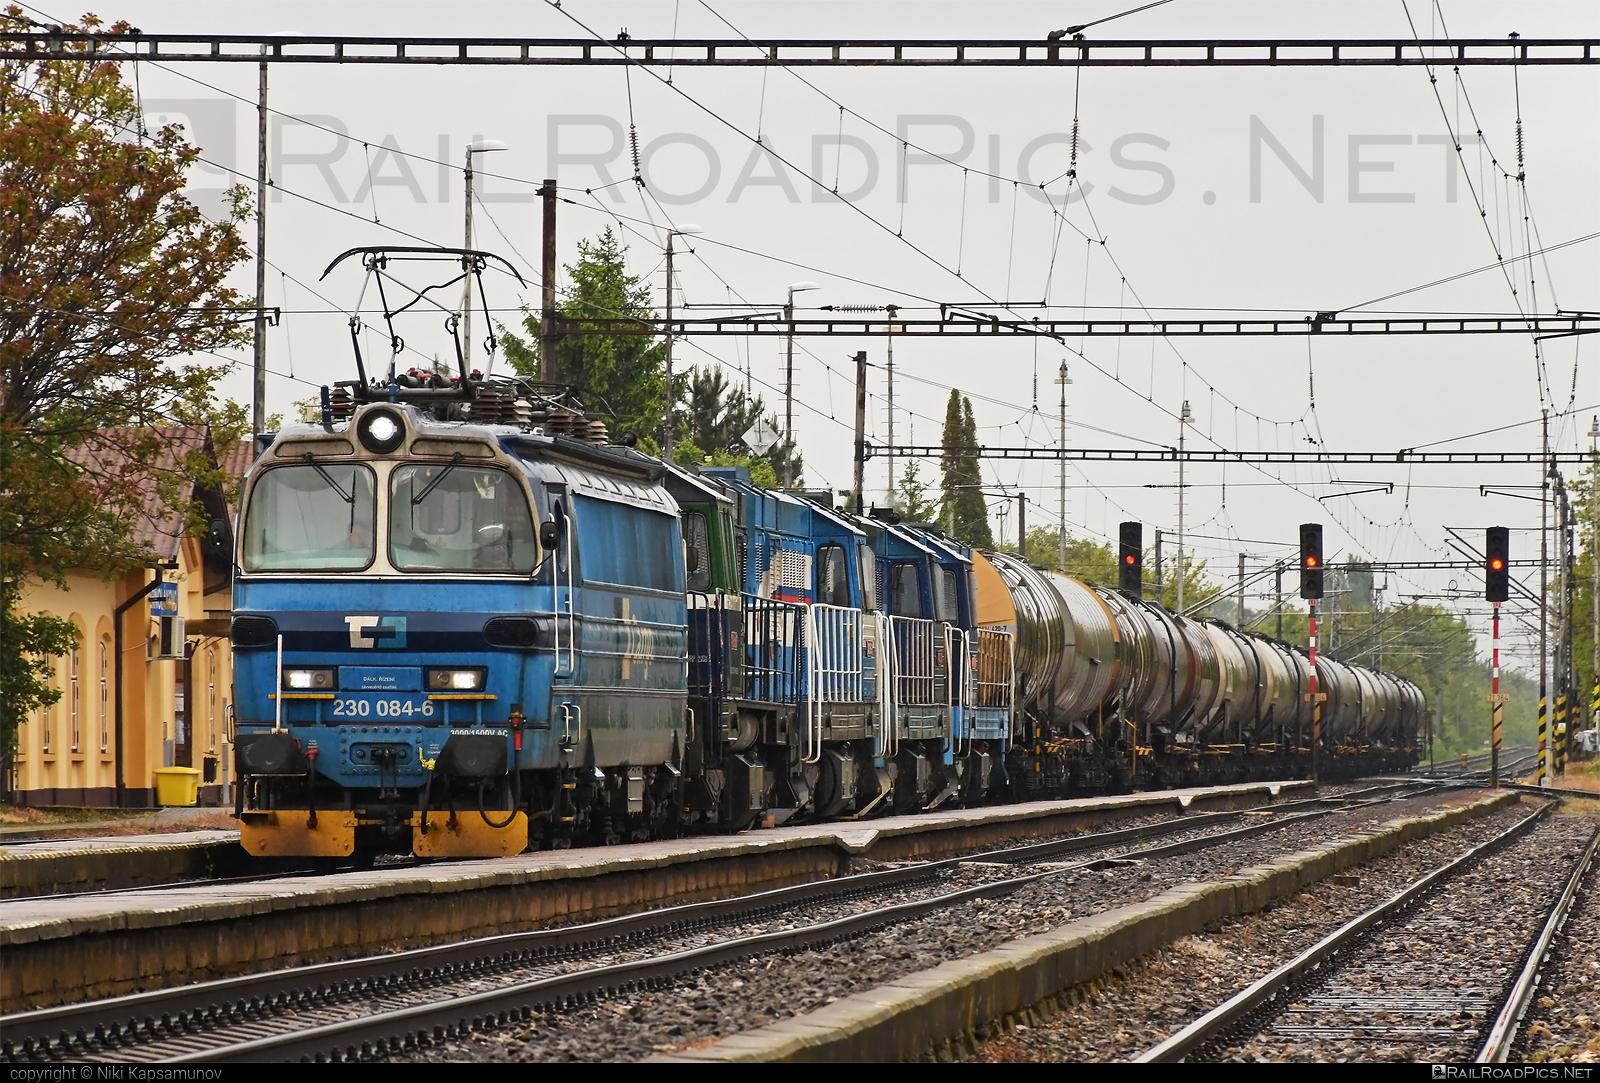 Škoda 47E - 230 084-6 operated by Retrack Slovakia s. r. o. #cd #cdc #cdcargoslovakia #cdcsk #kesselwagen #laminatka #locomotive240 #retrackslovakia #skoda #skoda47e #tankwagon